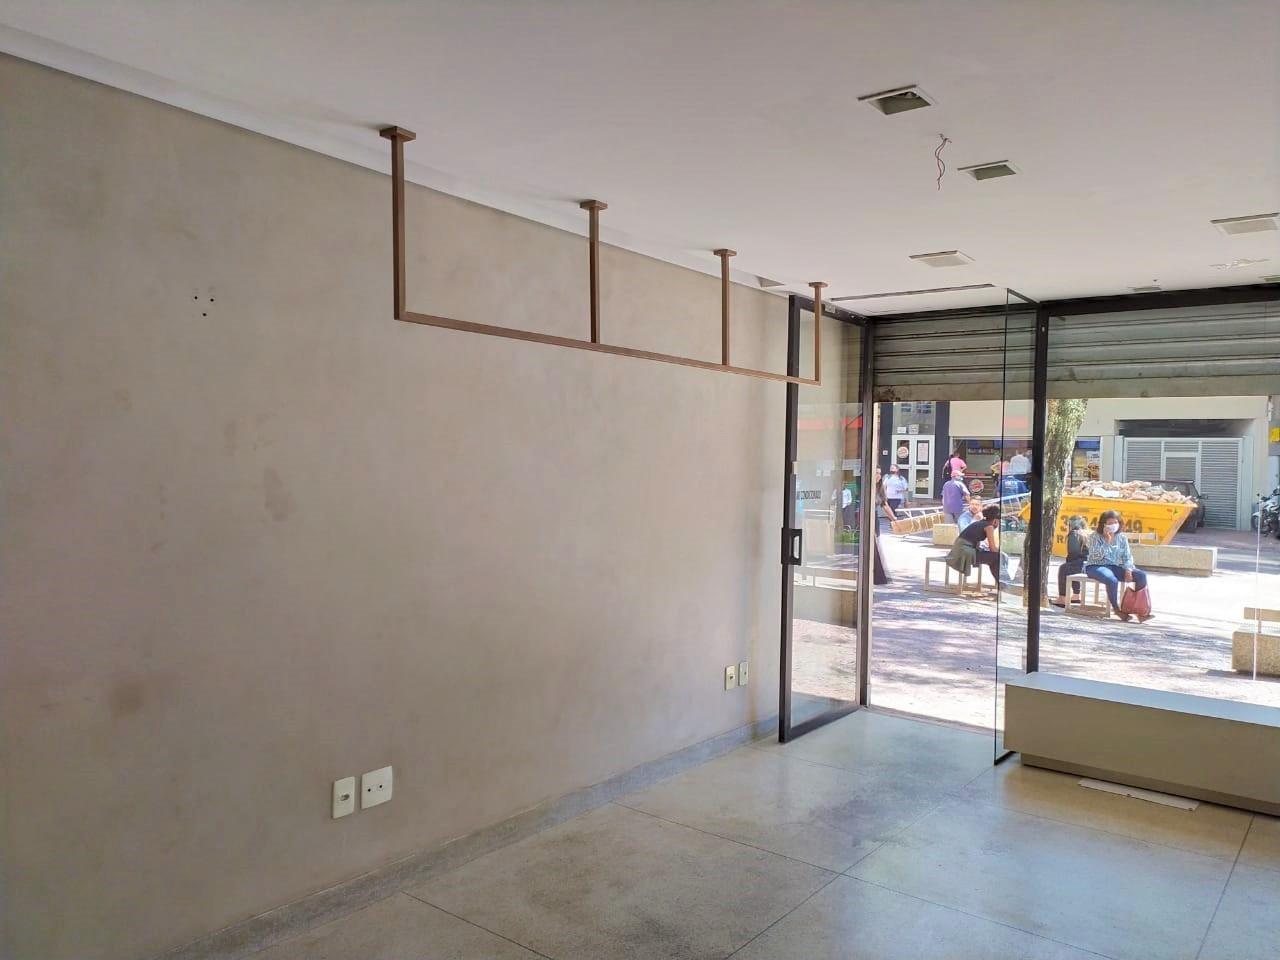 Loja para Aluguel em Savassi, Belo Horizonte - COD: 1093